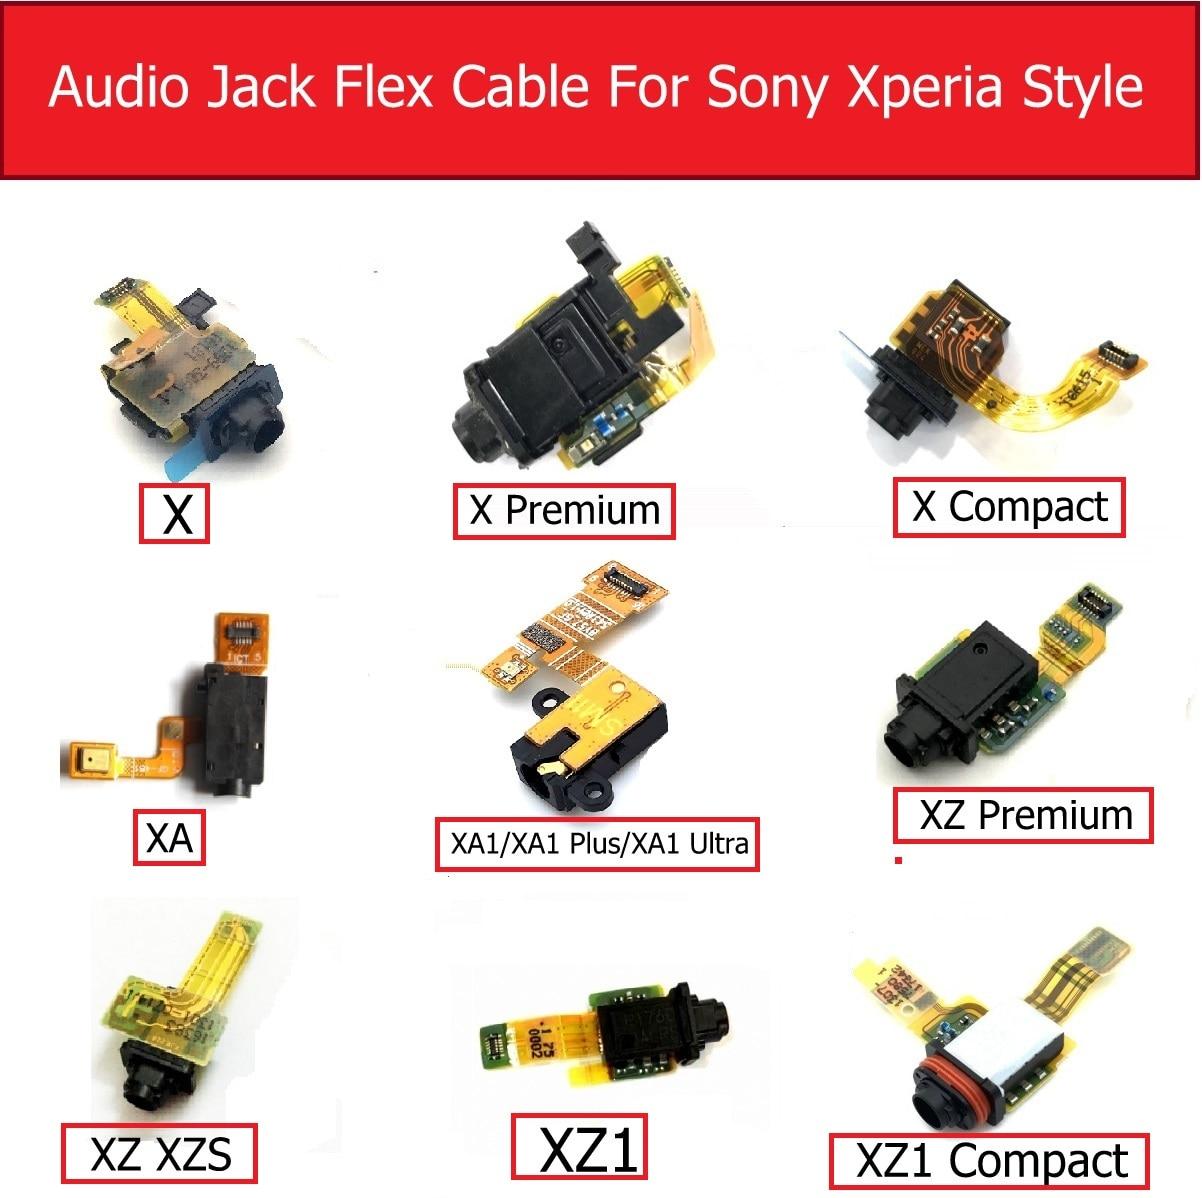 Гибкий кабель аудиоразъема для Sony Xperia X/X Compact/X Performance/XA/XA1/XA1P/XA1 Ultra/XZ Premium/XZ/XZS/XZ1/XZ1 mini